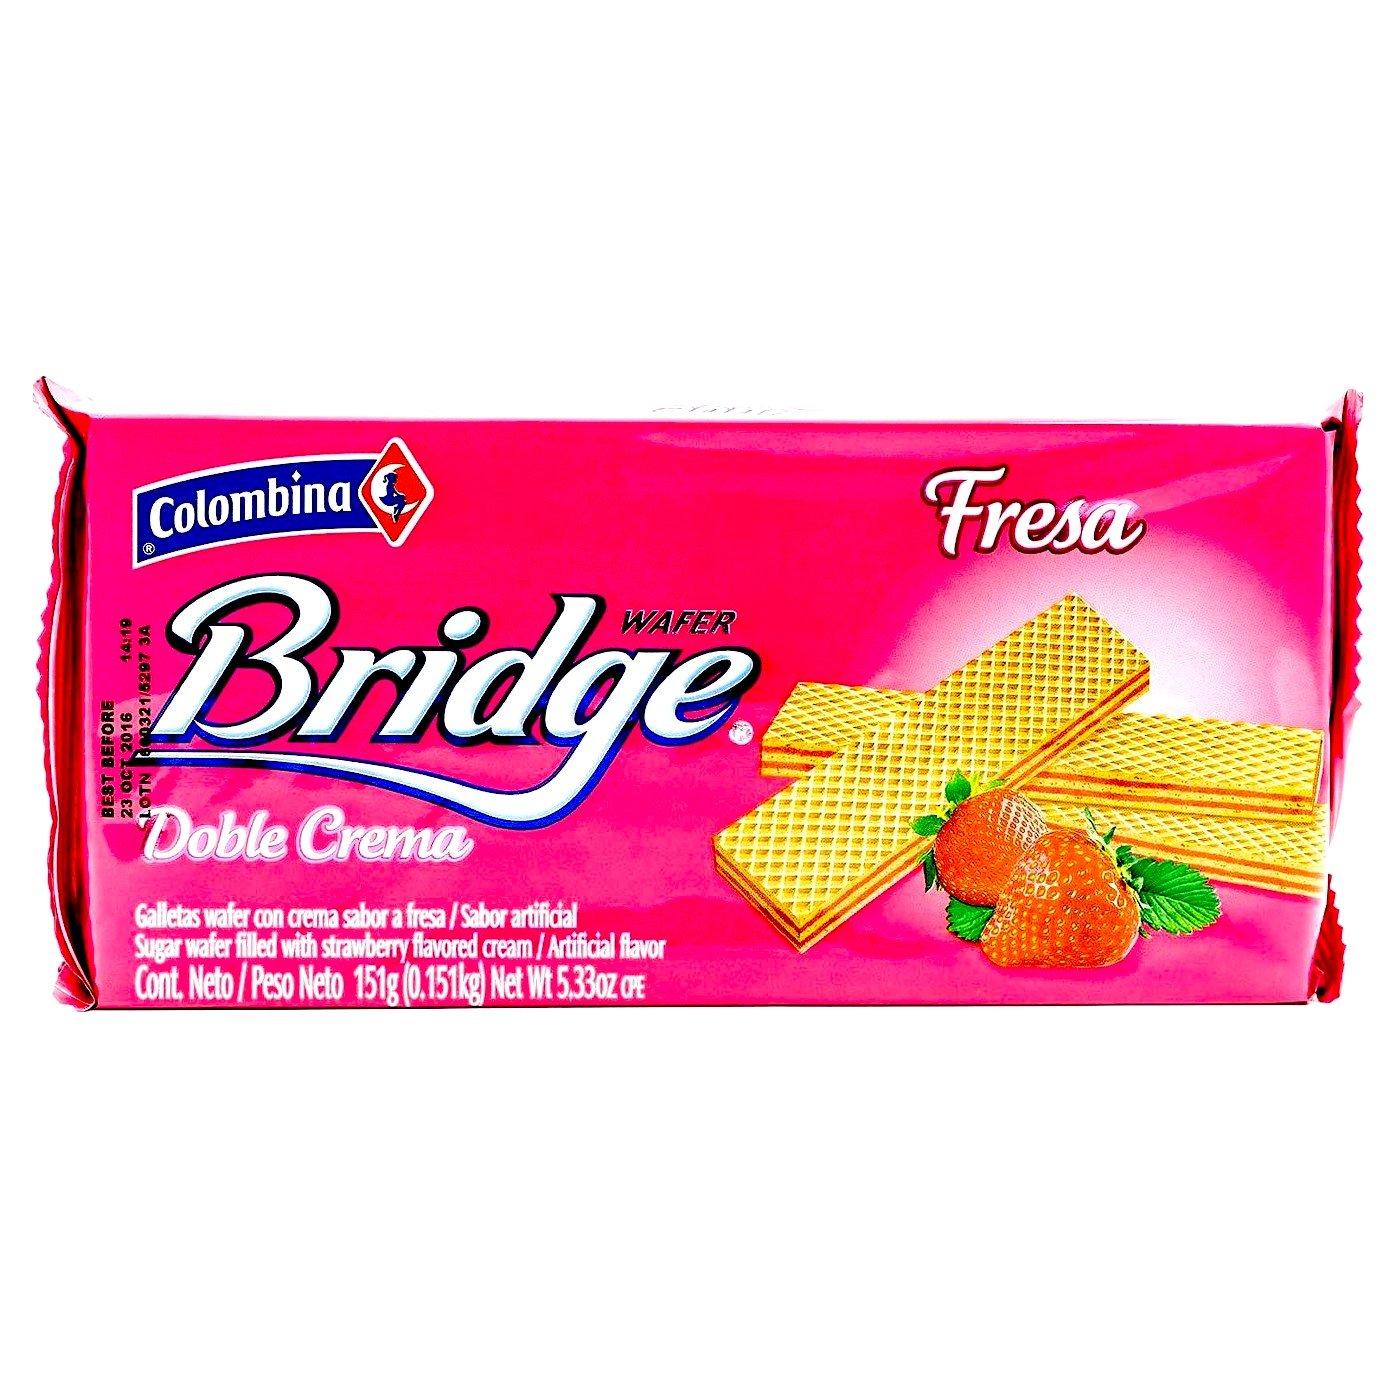 Amazon.com : Colombina Bridge Sugar Wafer (Pack of 24) : Grocery & Gourmet Food